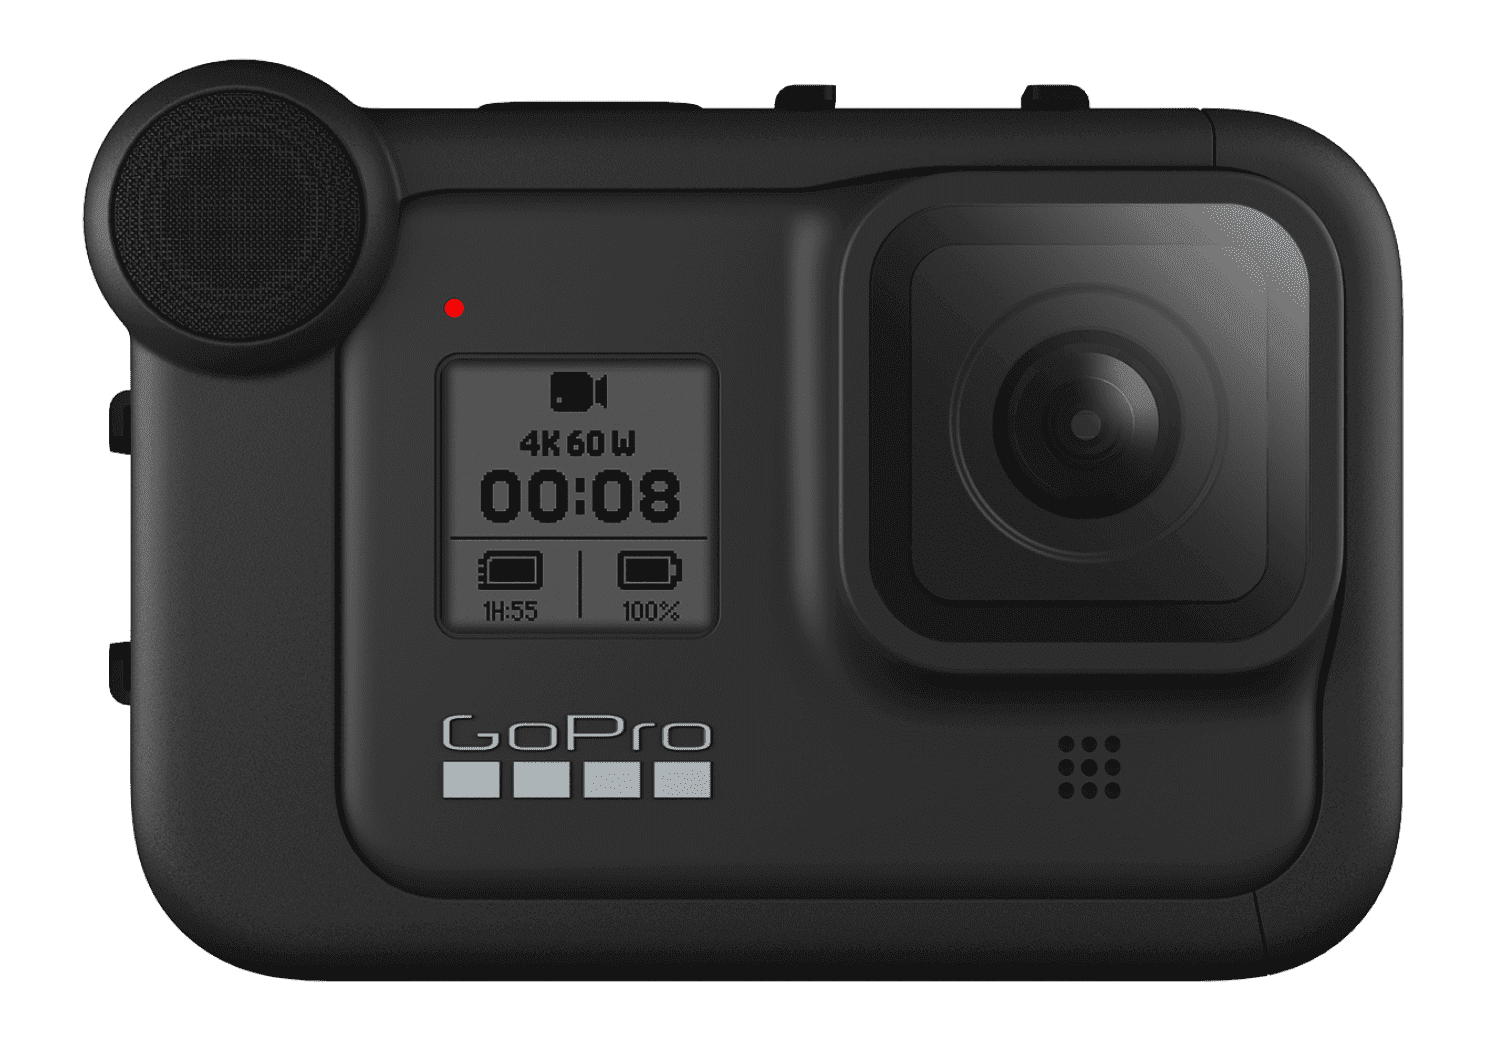 imagen-delantera-modulo-multimedia-hero-black